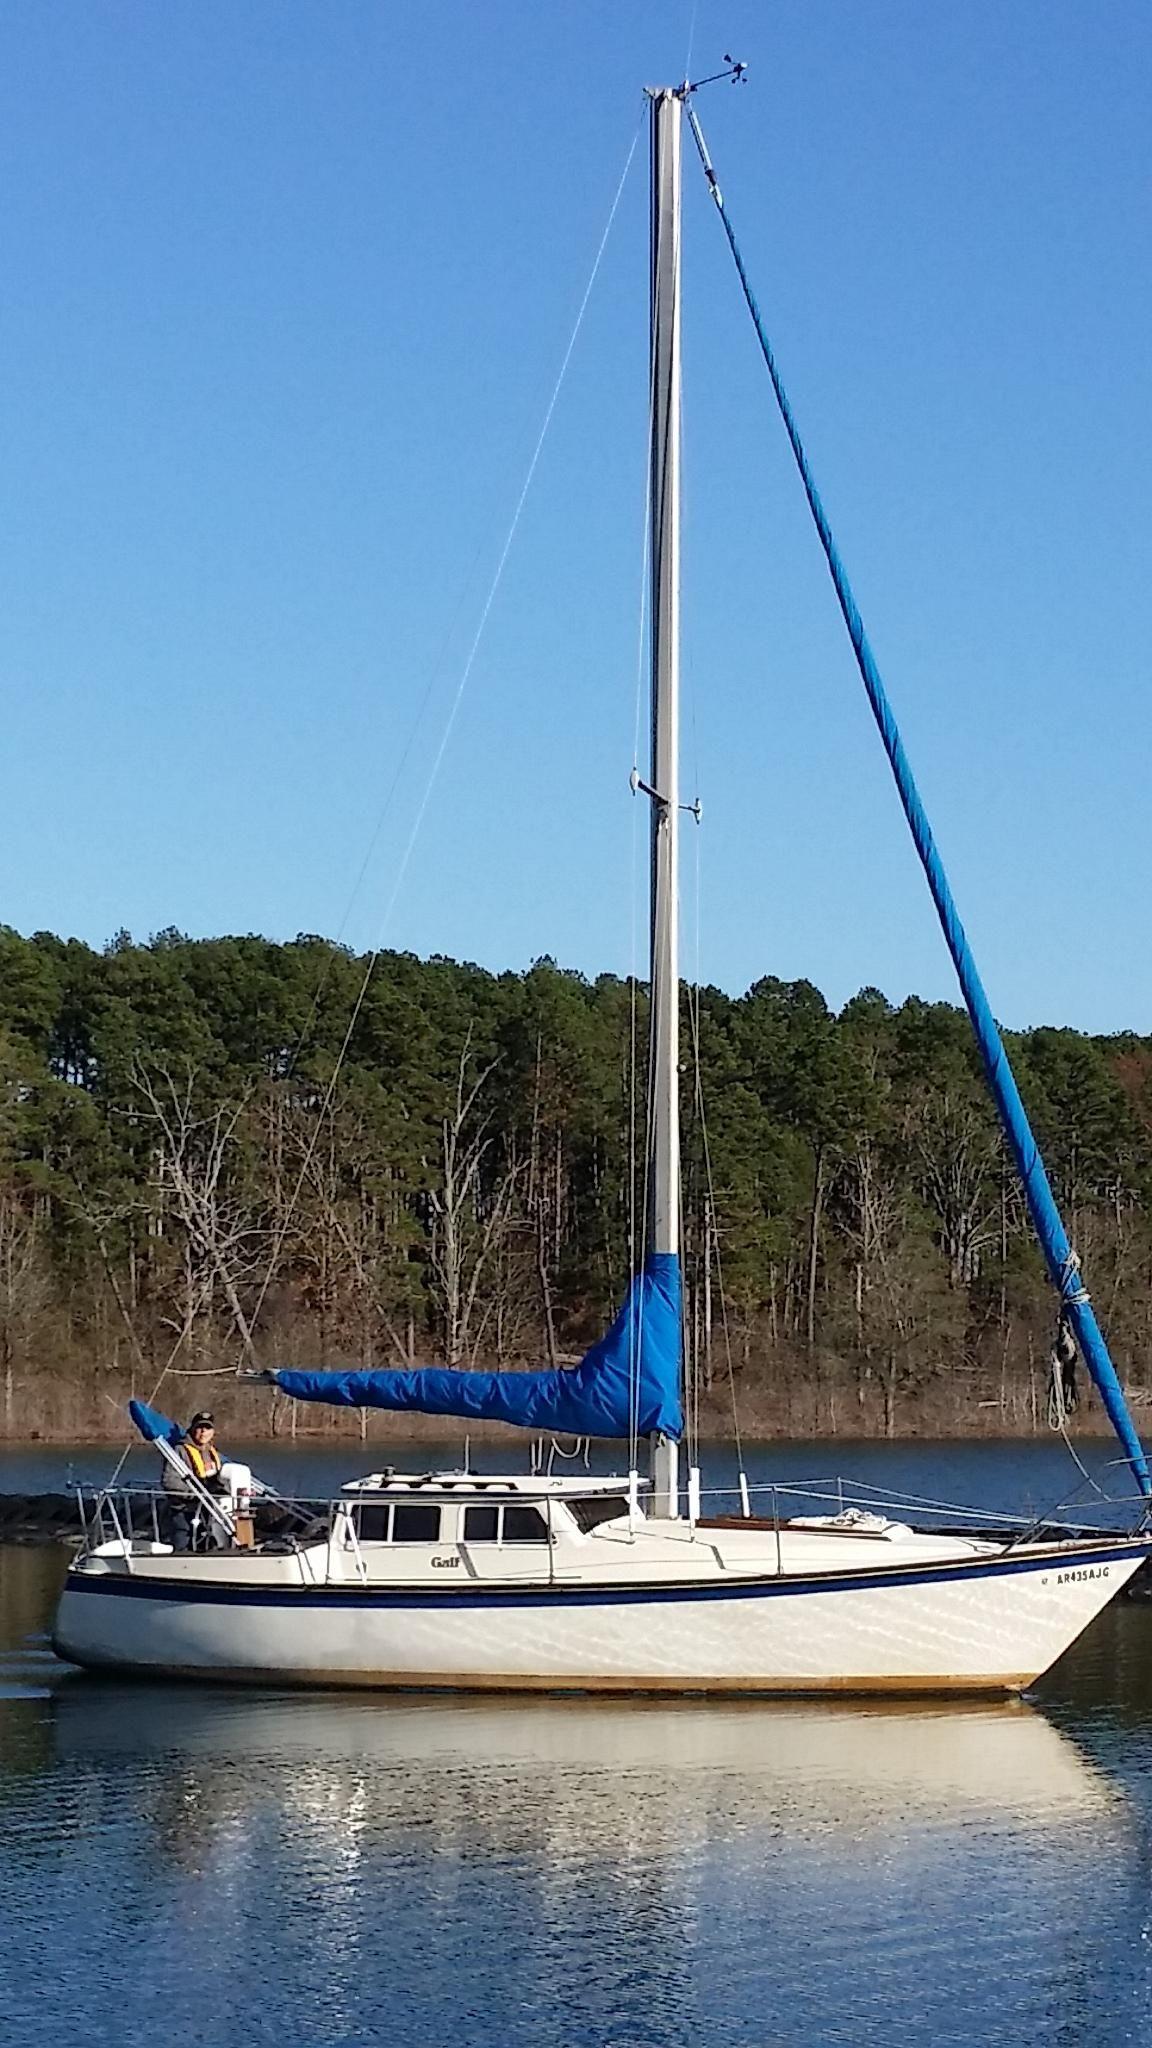 1980 Capital Gulf 29 Sail Boat For Sale - www yachtworld com